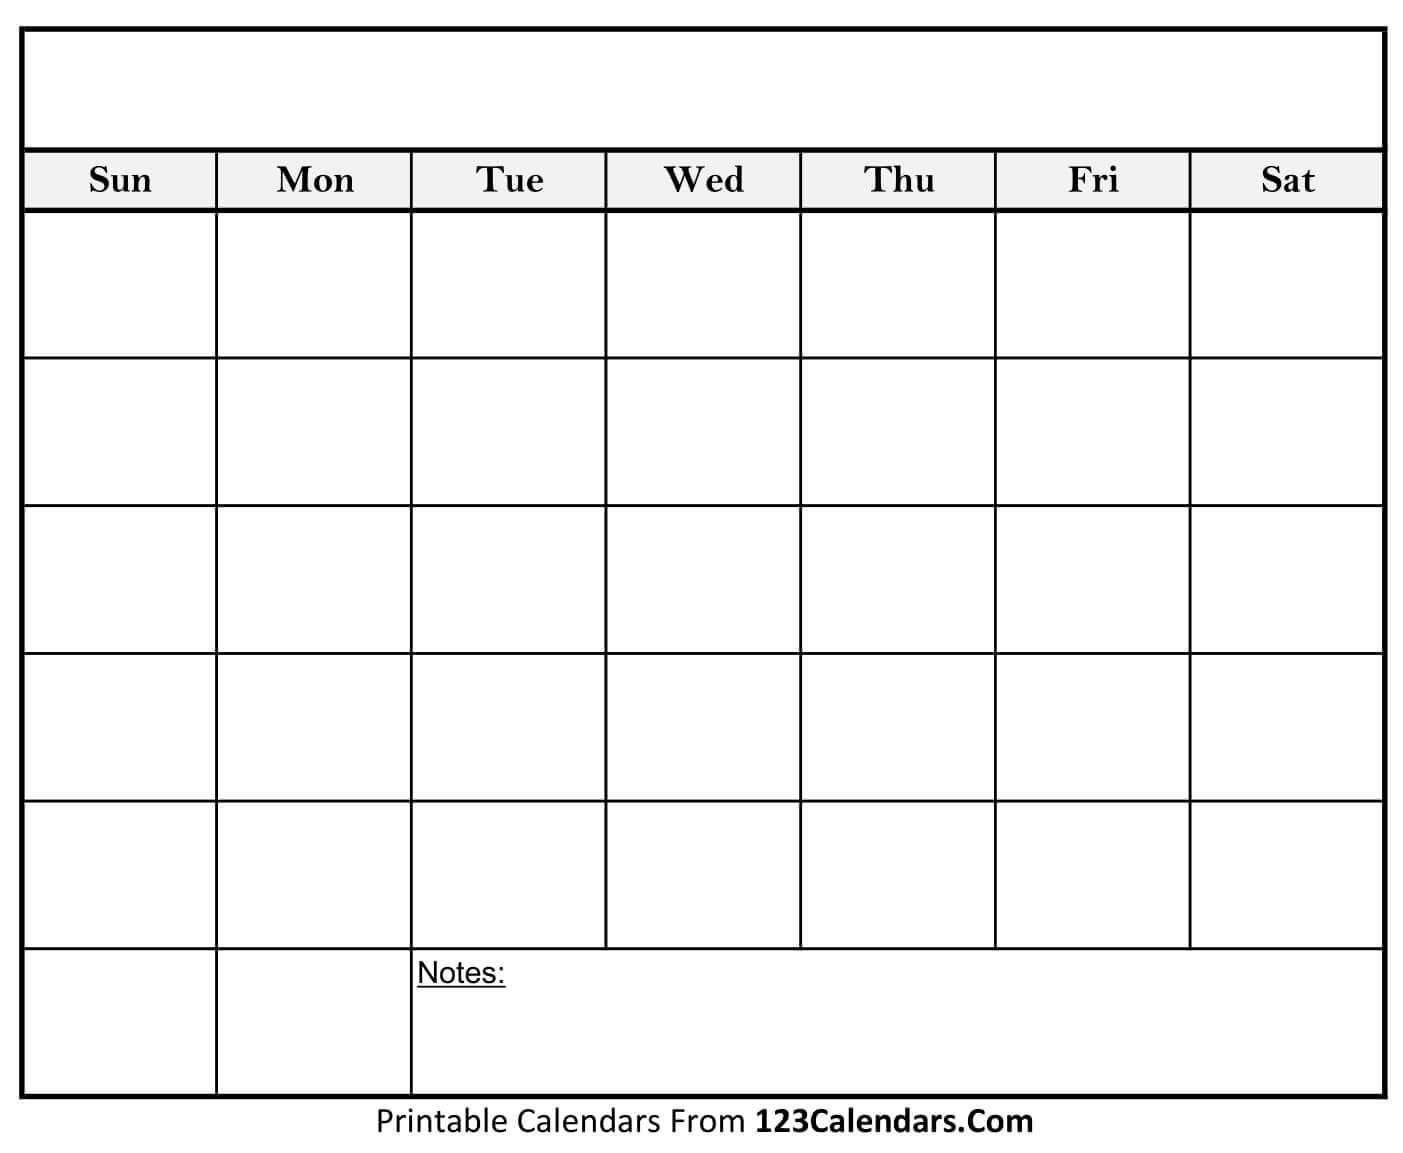 Free Printable Blank Calendar | 123Calendars  Printable Full Page Blank Calendar Template